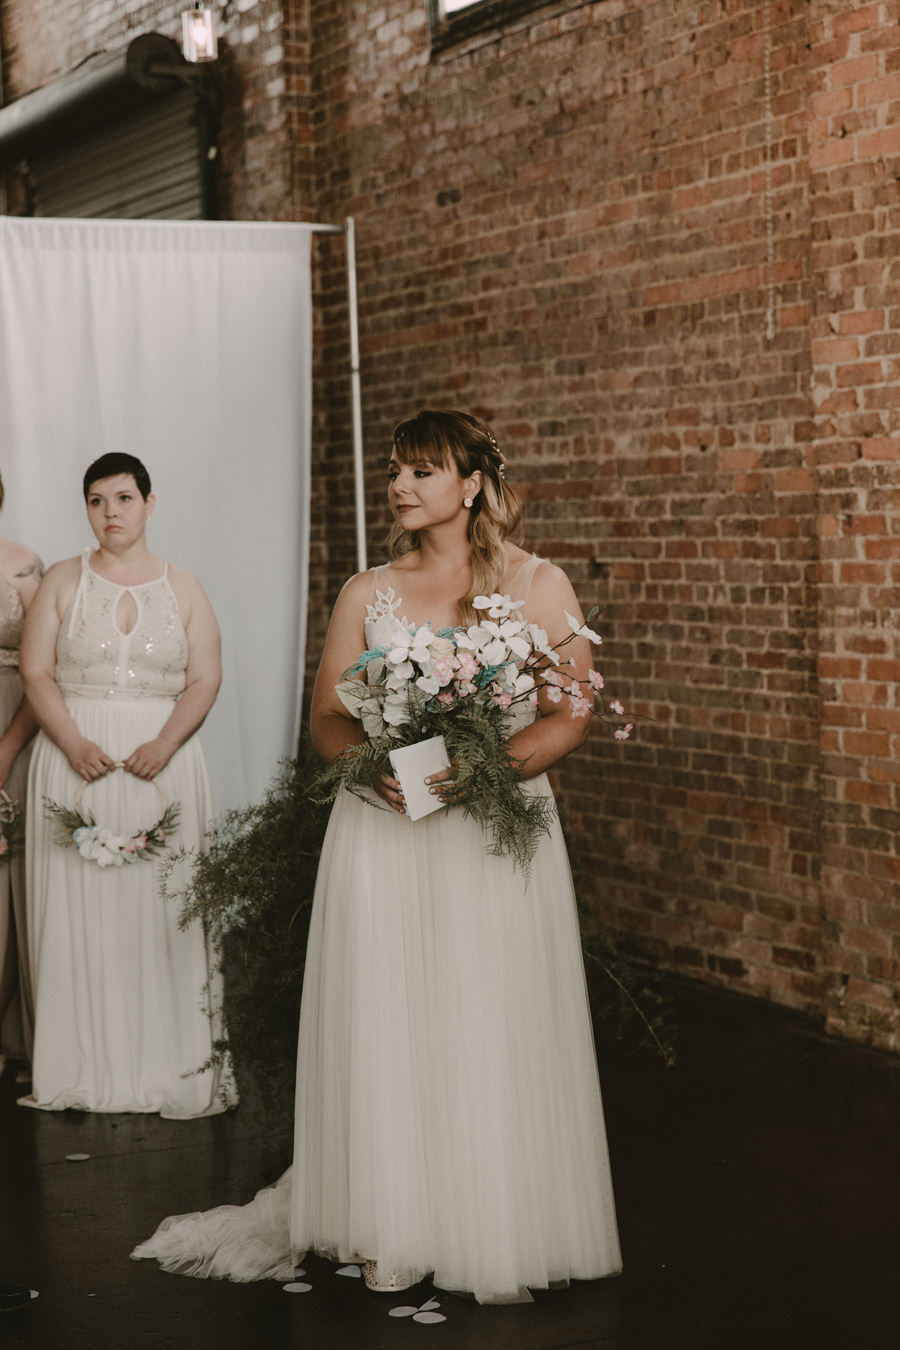 VeronicaandGarrett's Industrial Cavu Tampa Heights Wedding BHLDN gown Salt Block Hospitality Fancy Free Nursery Foundation Coffee-132.jpg